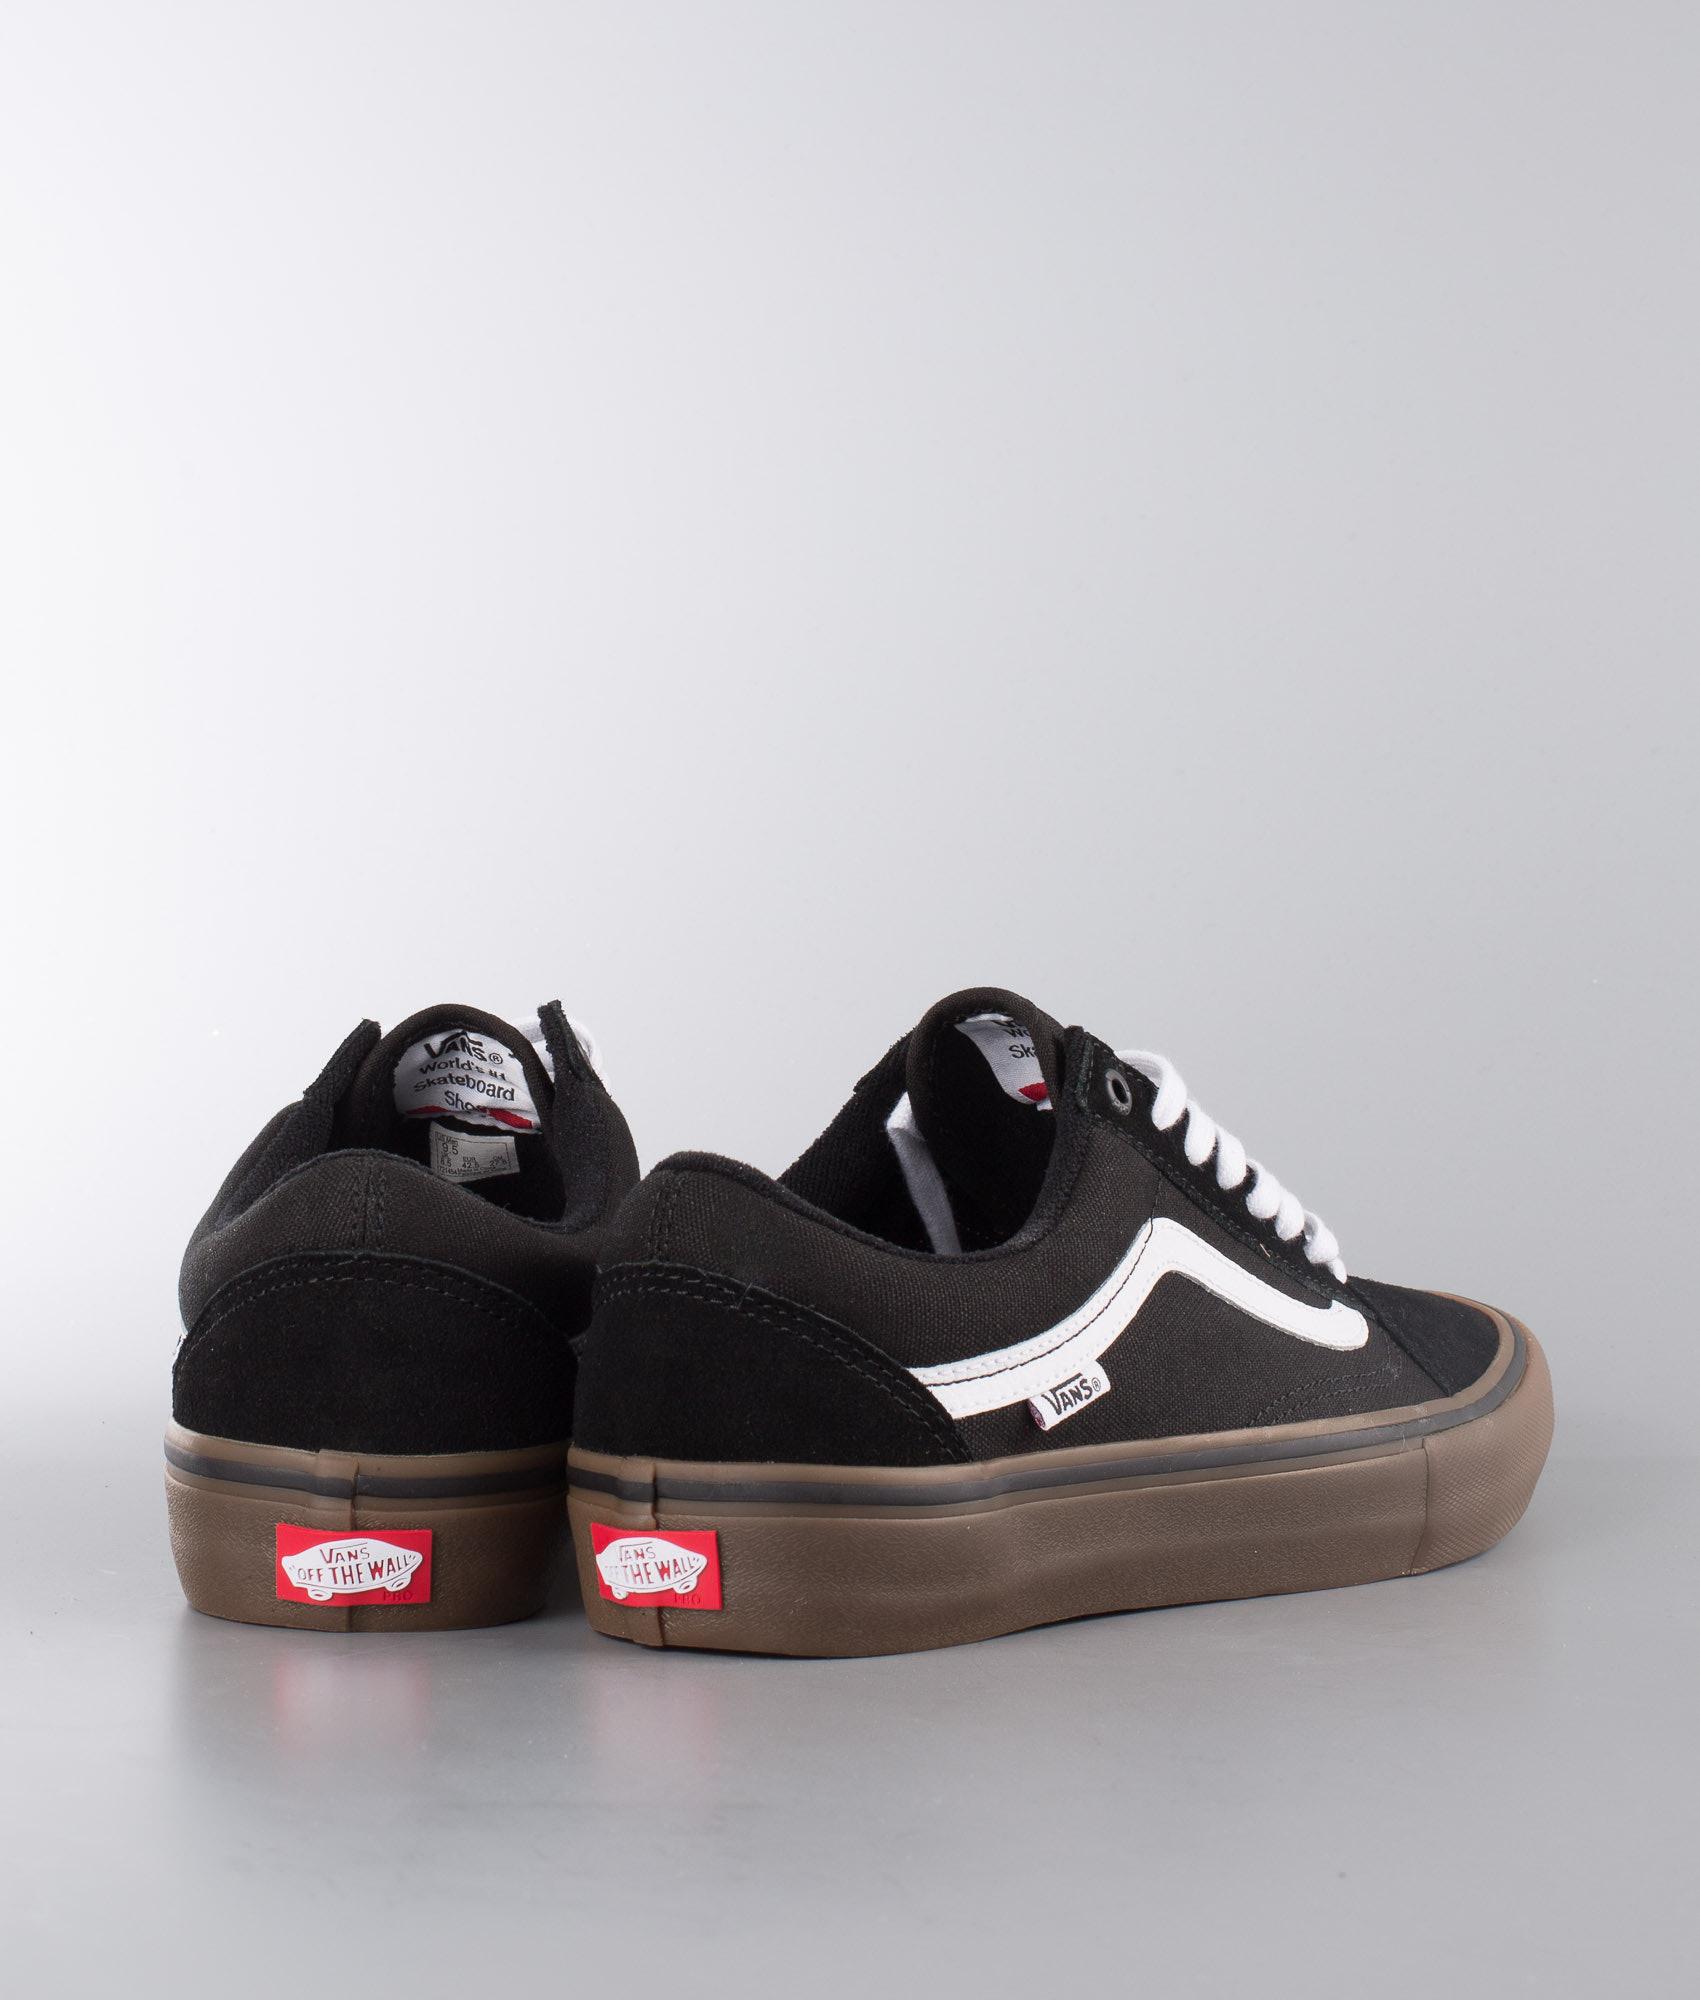 Vans Old Skool Pro Shoes Black White Medium Gum - Ridestore.com 9bb195bee